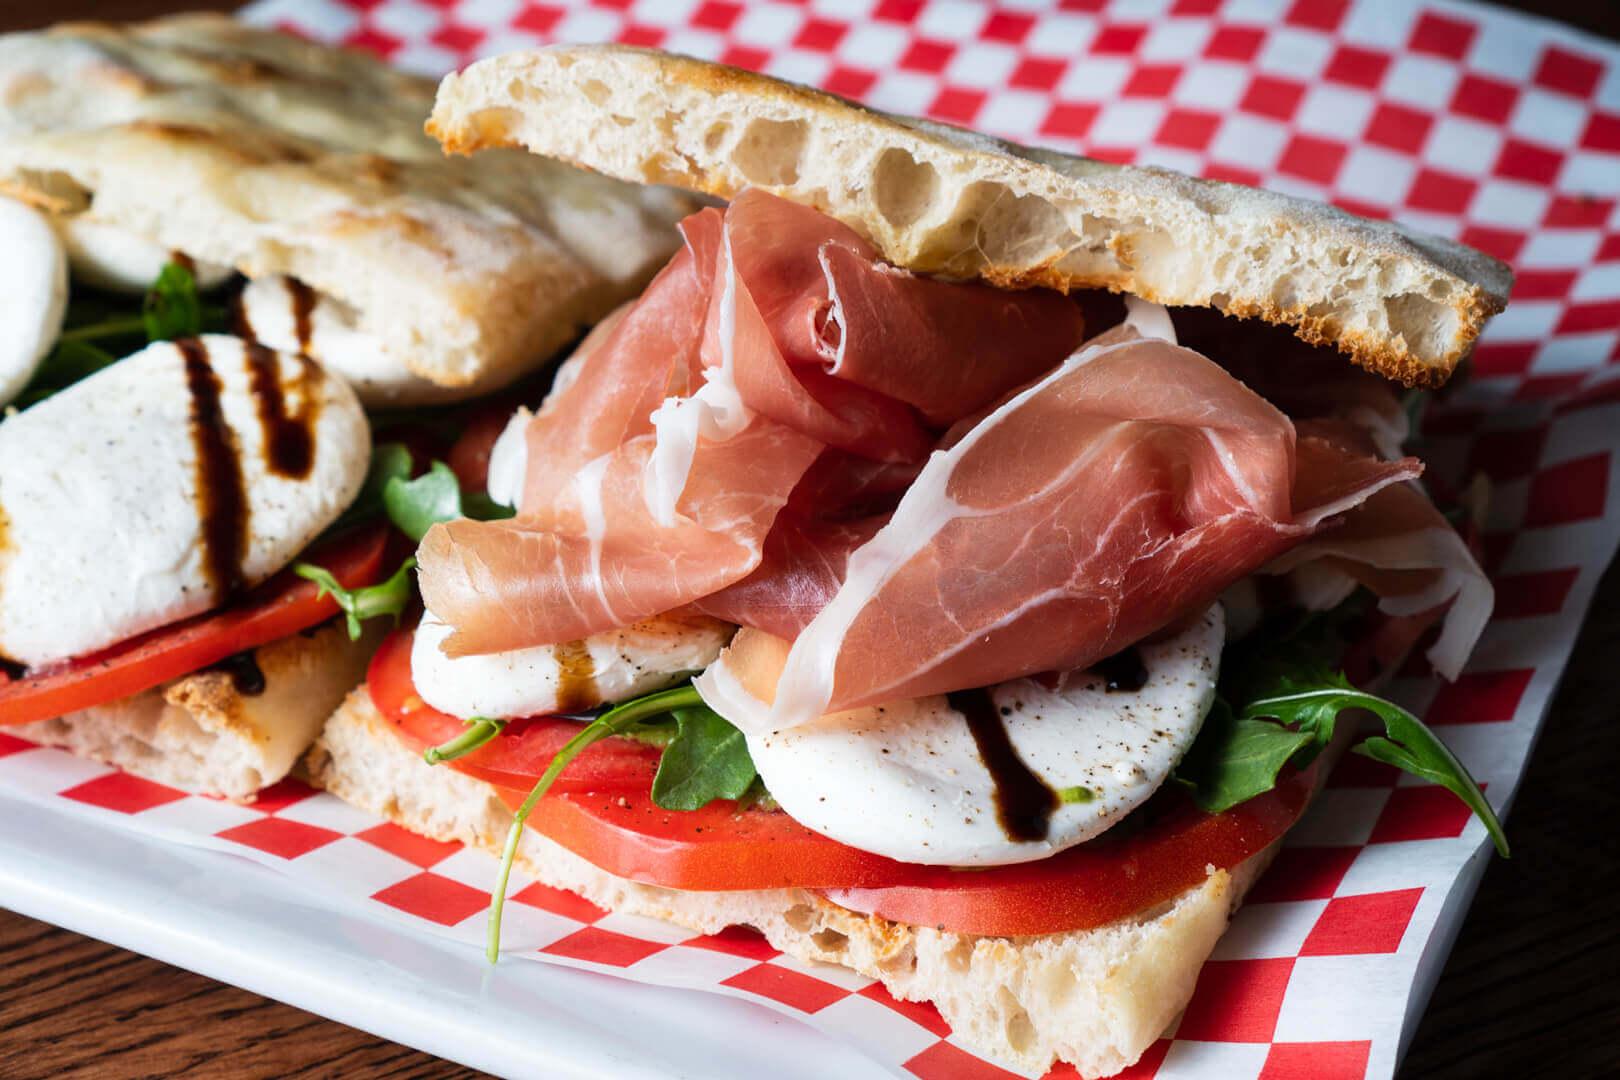 Luchini Food Gallery